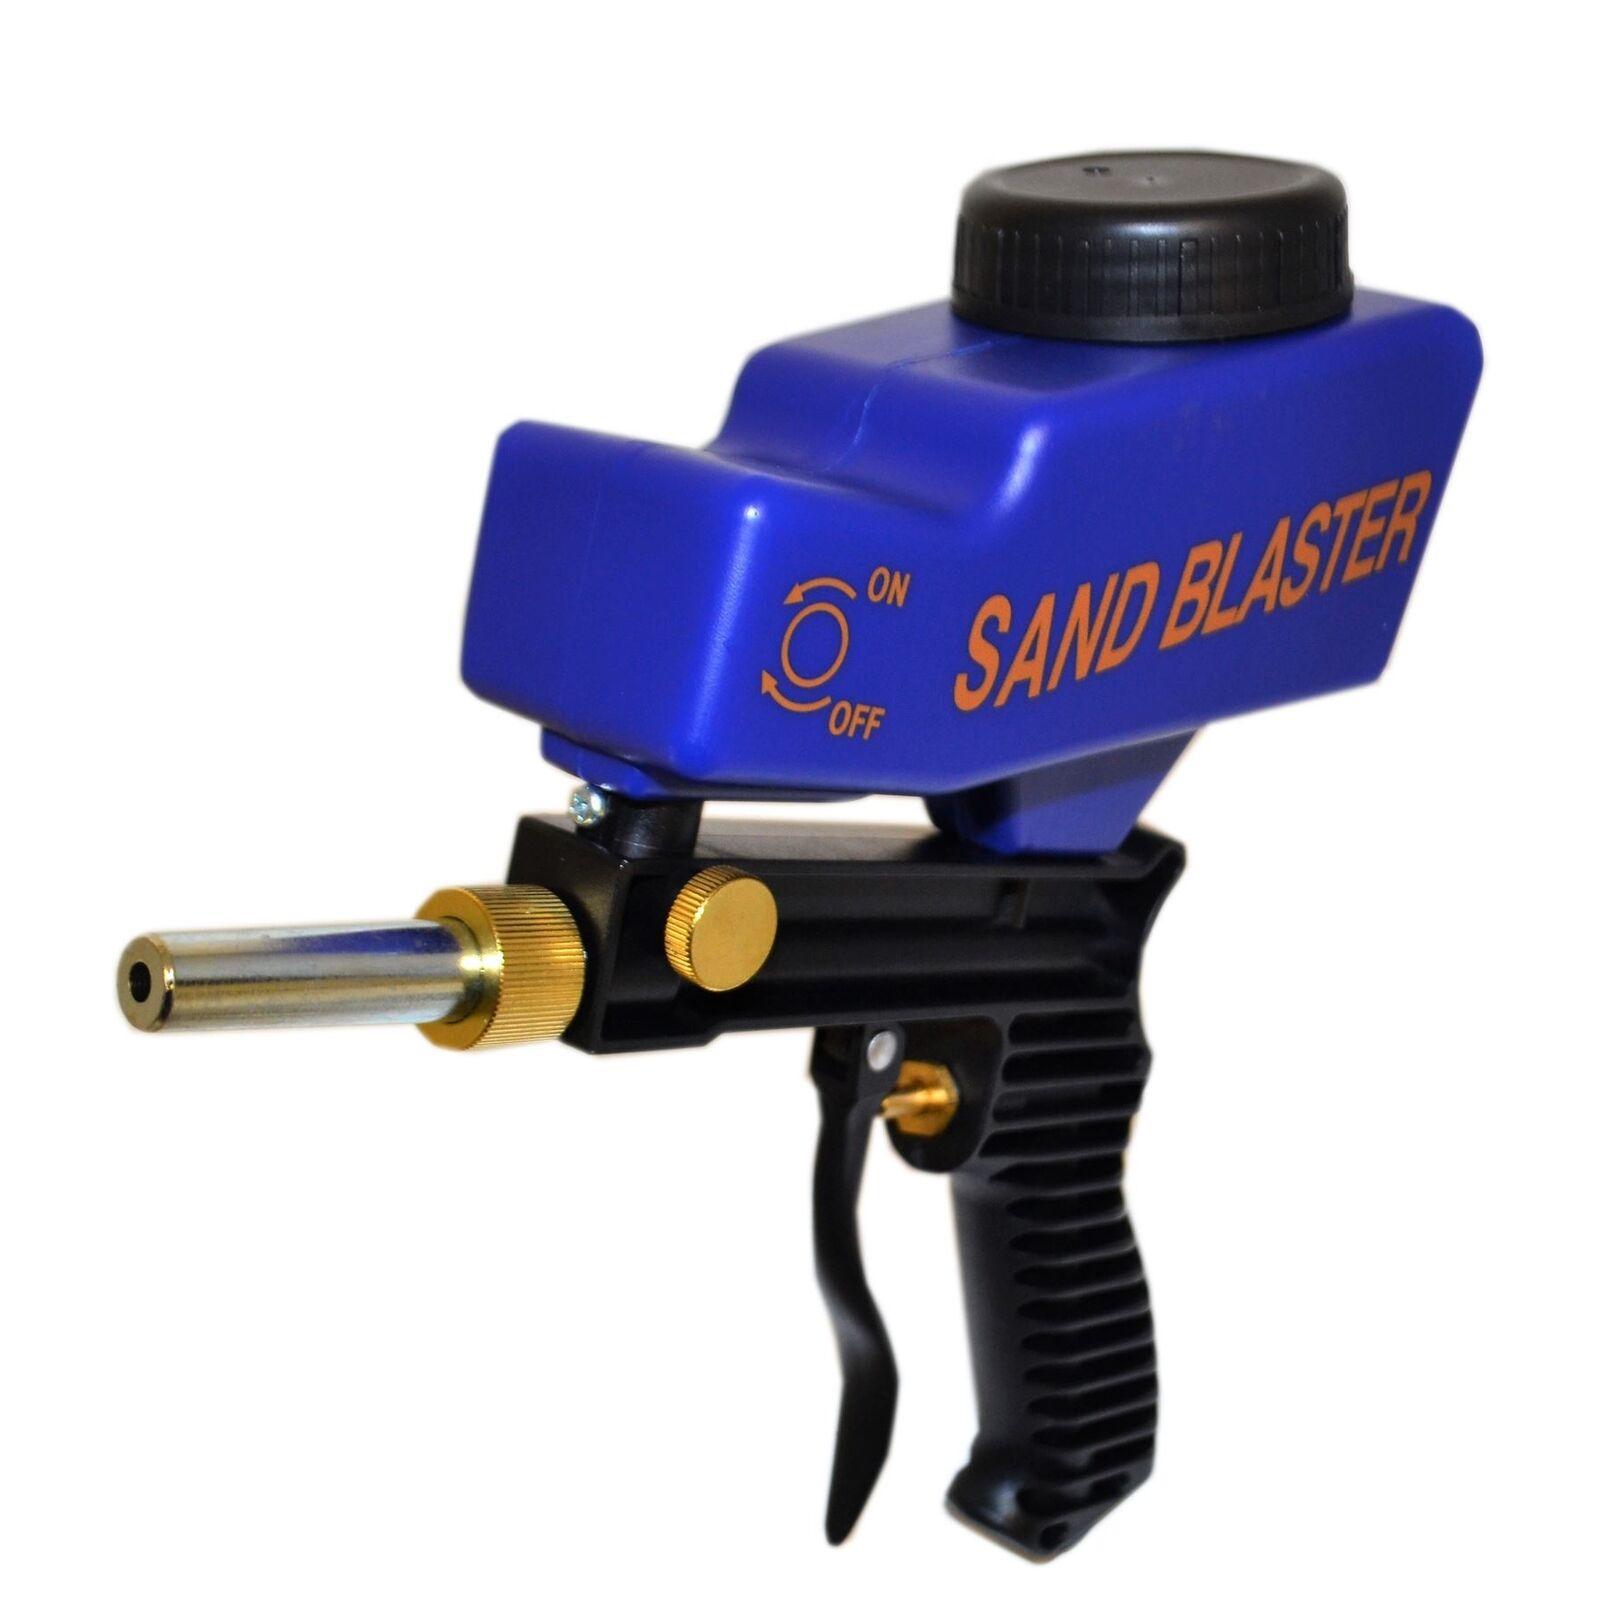 Pot Air Sandblaster Kit Grit Shot Sand Remover Blaster Rust Paint Remover Sand Removal Tool f50eae